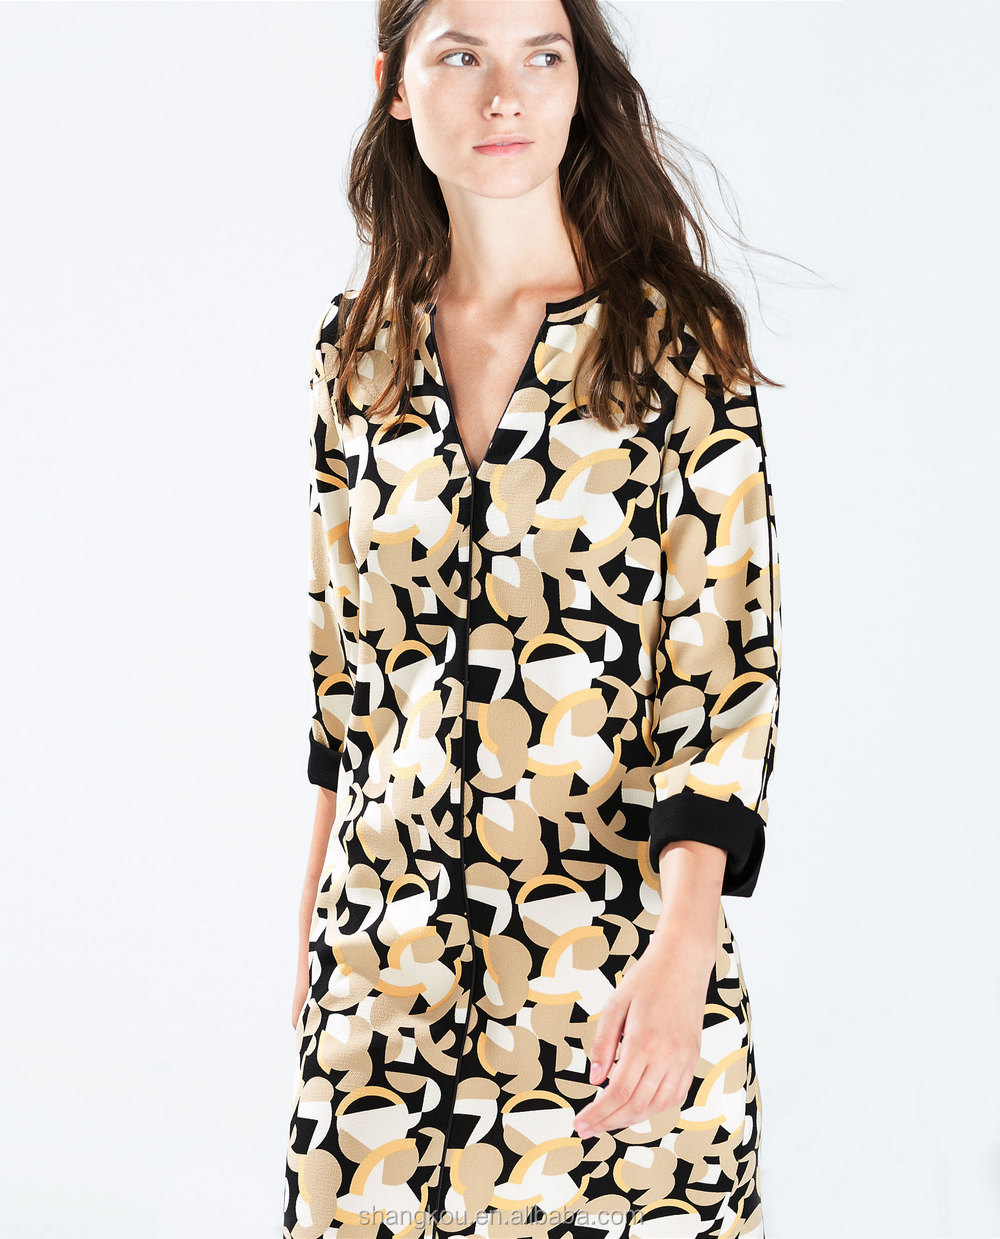 Plus Size Women Clothing,Smart Casual Clothing For Women,Korean ...